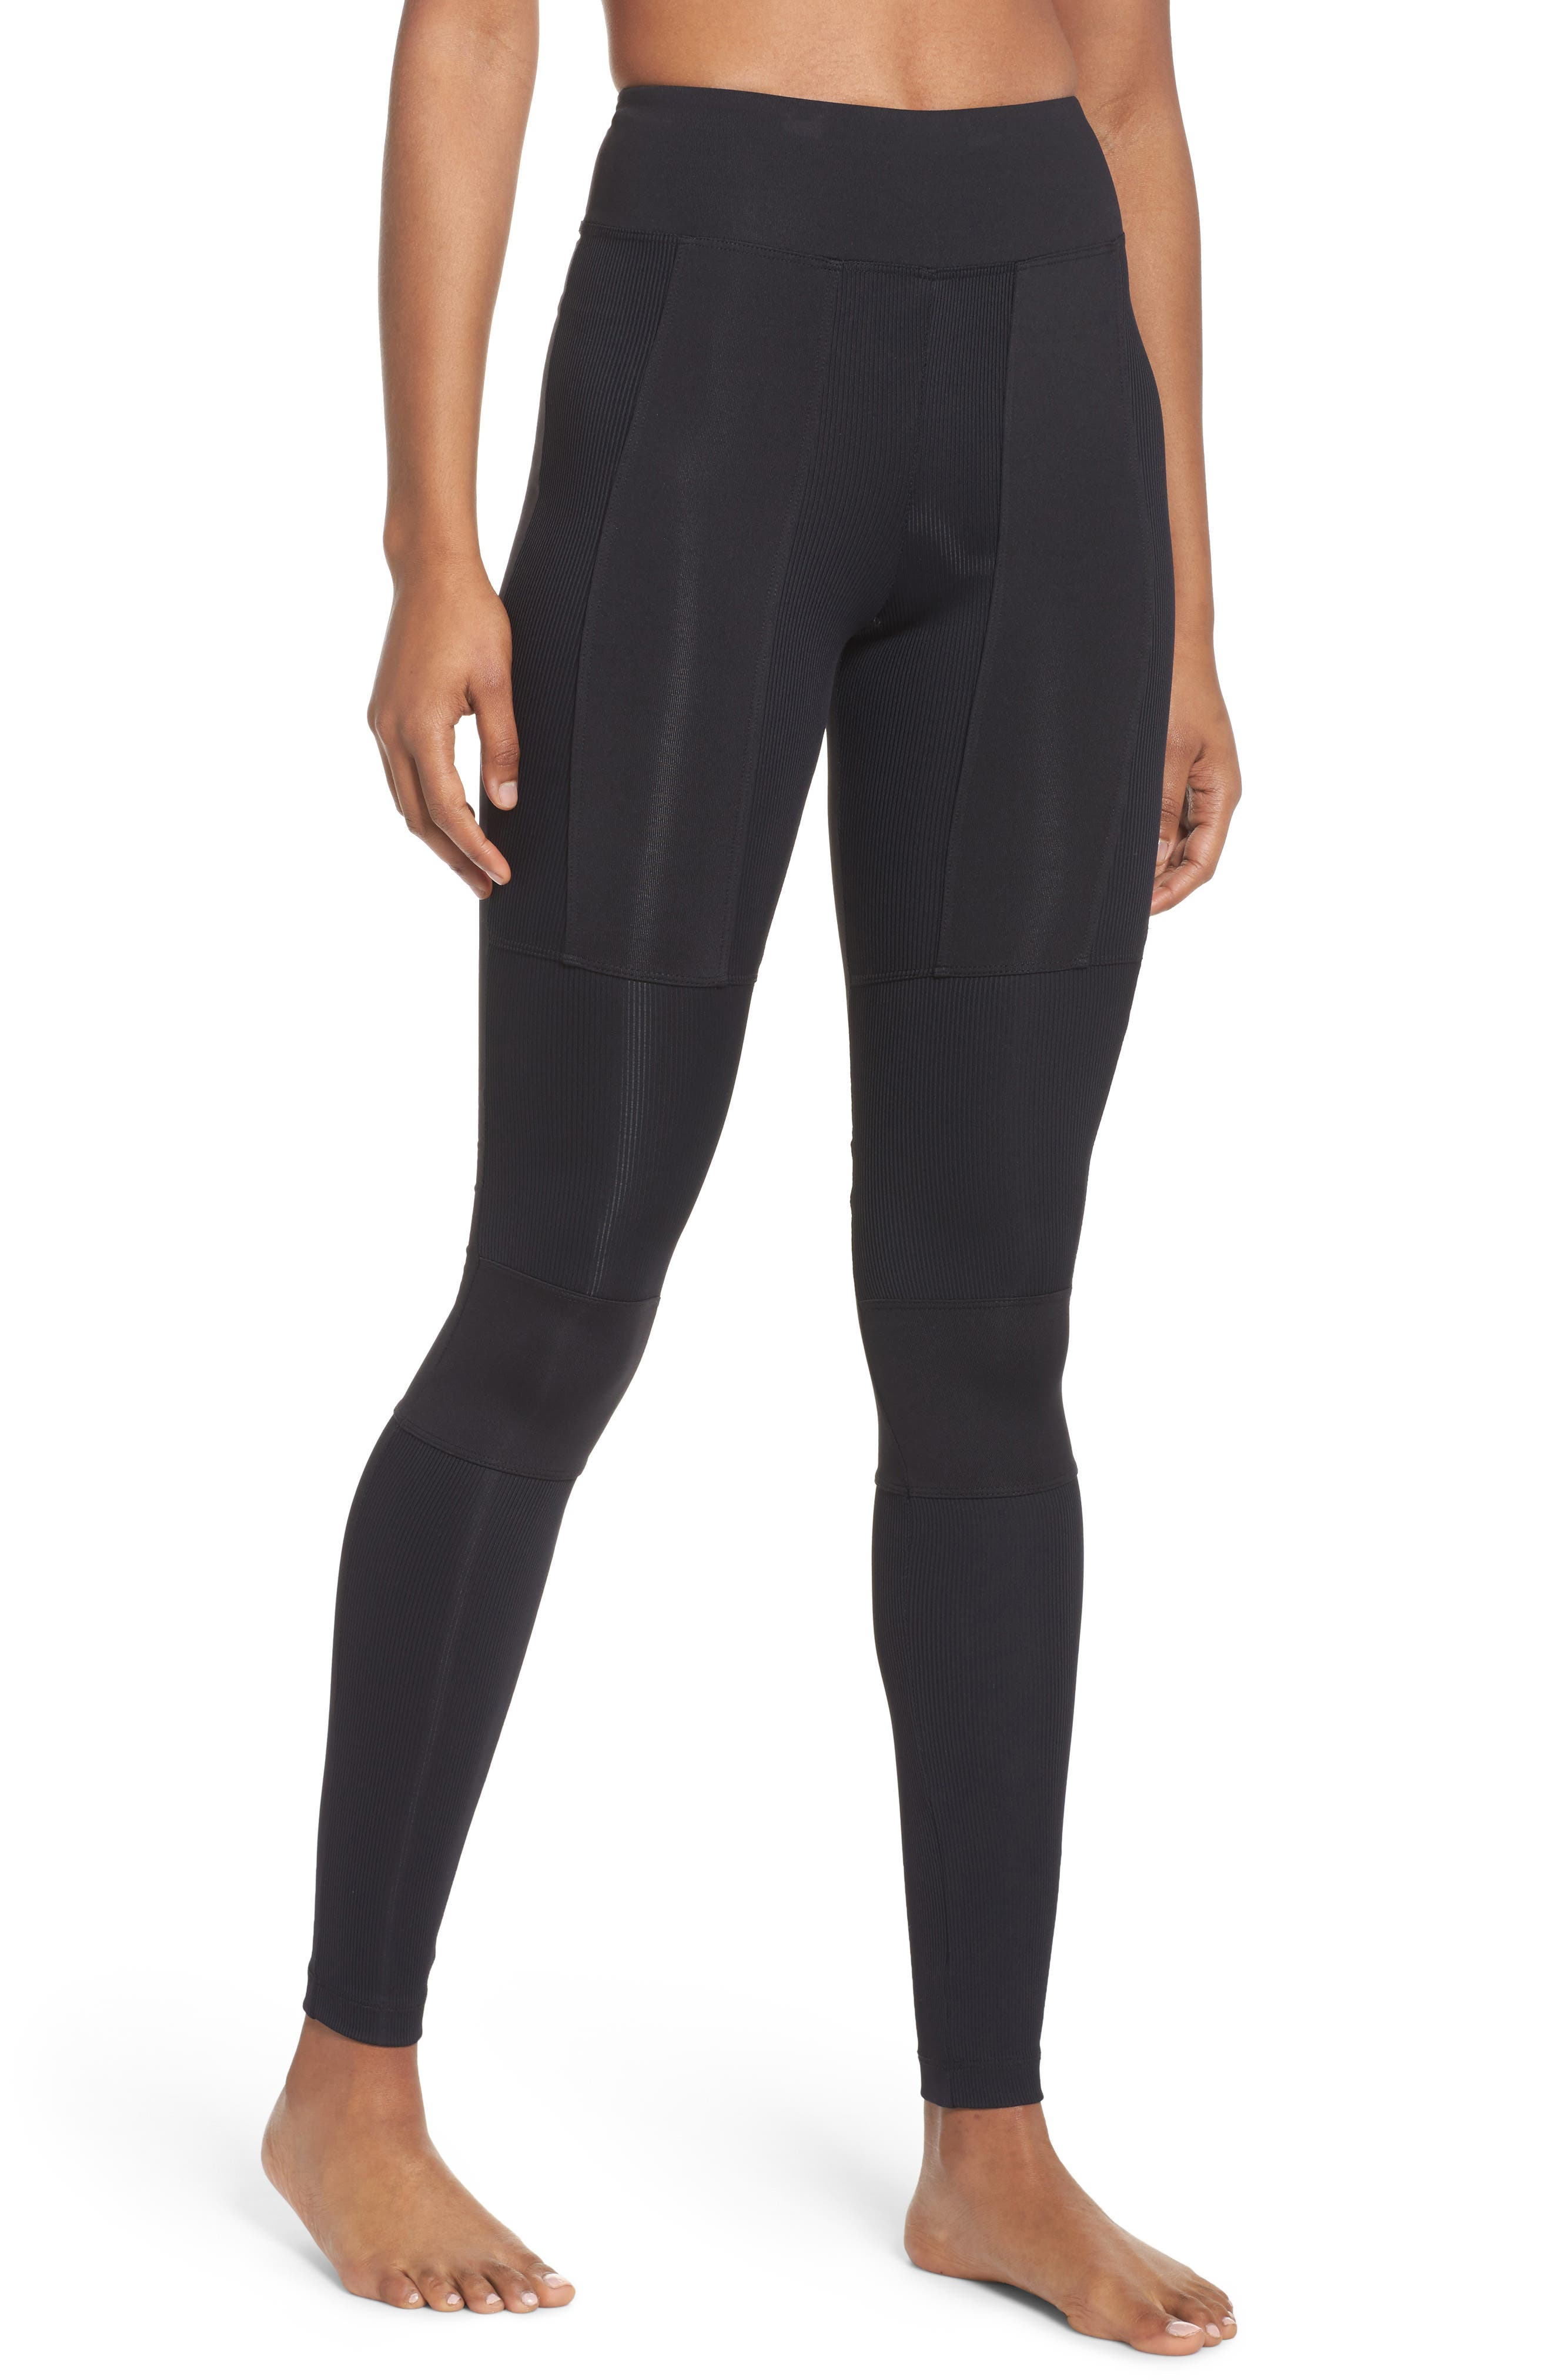 Rappel High Waist Leggings,                         Main,                         color, Black